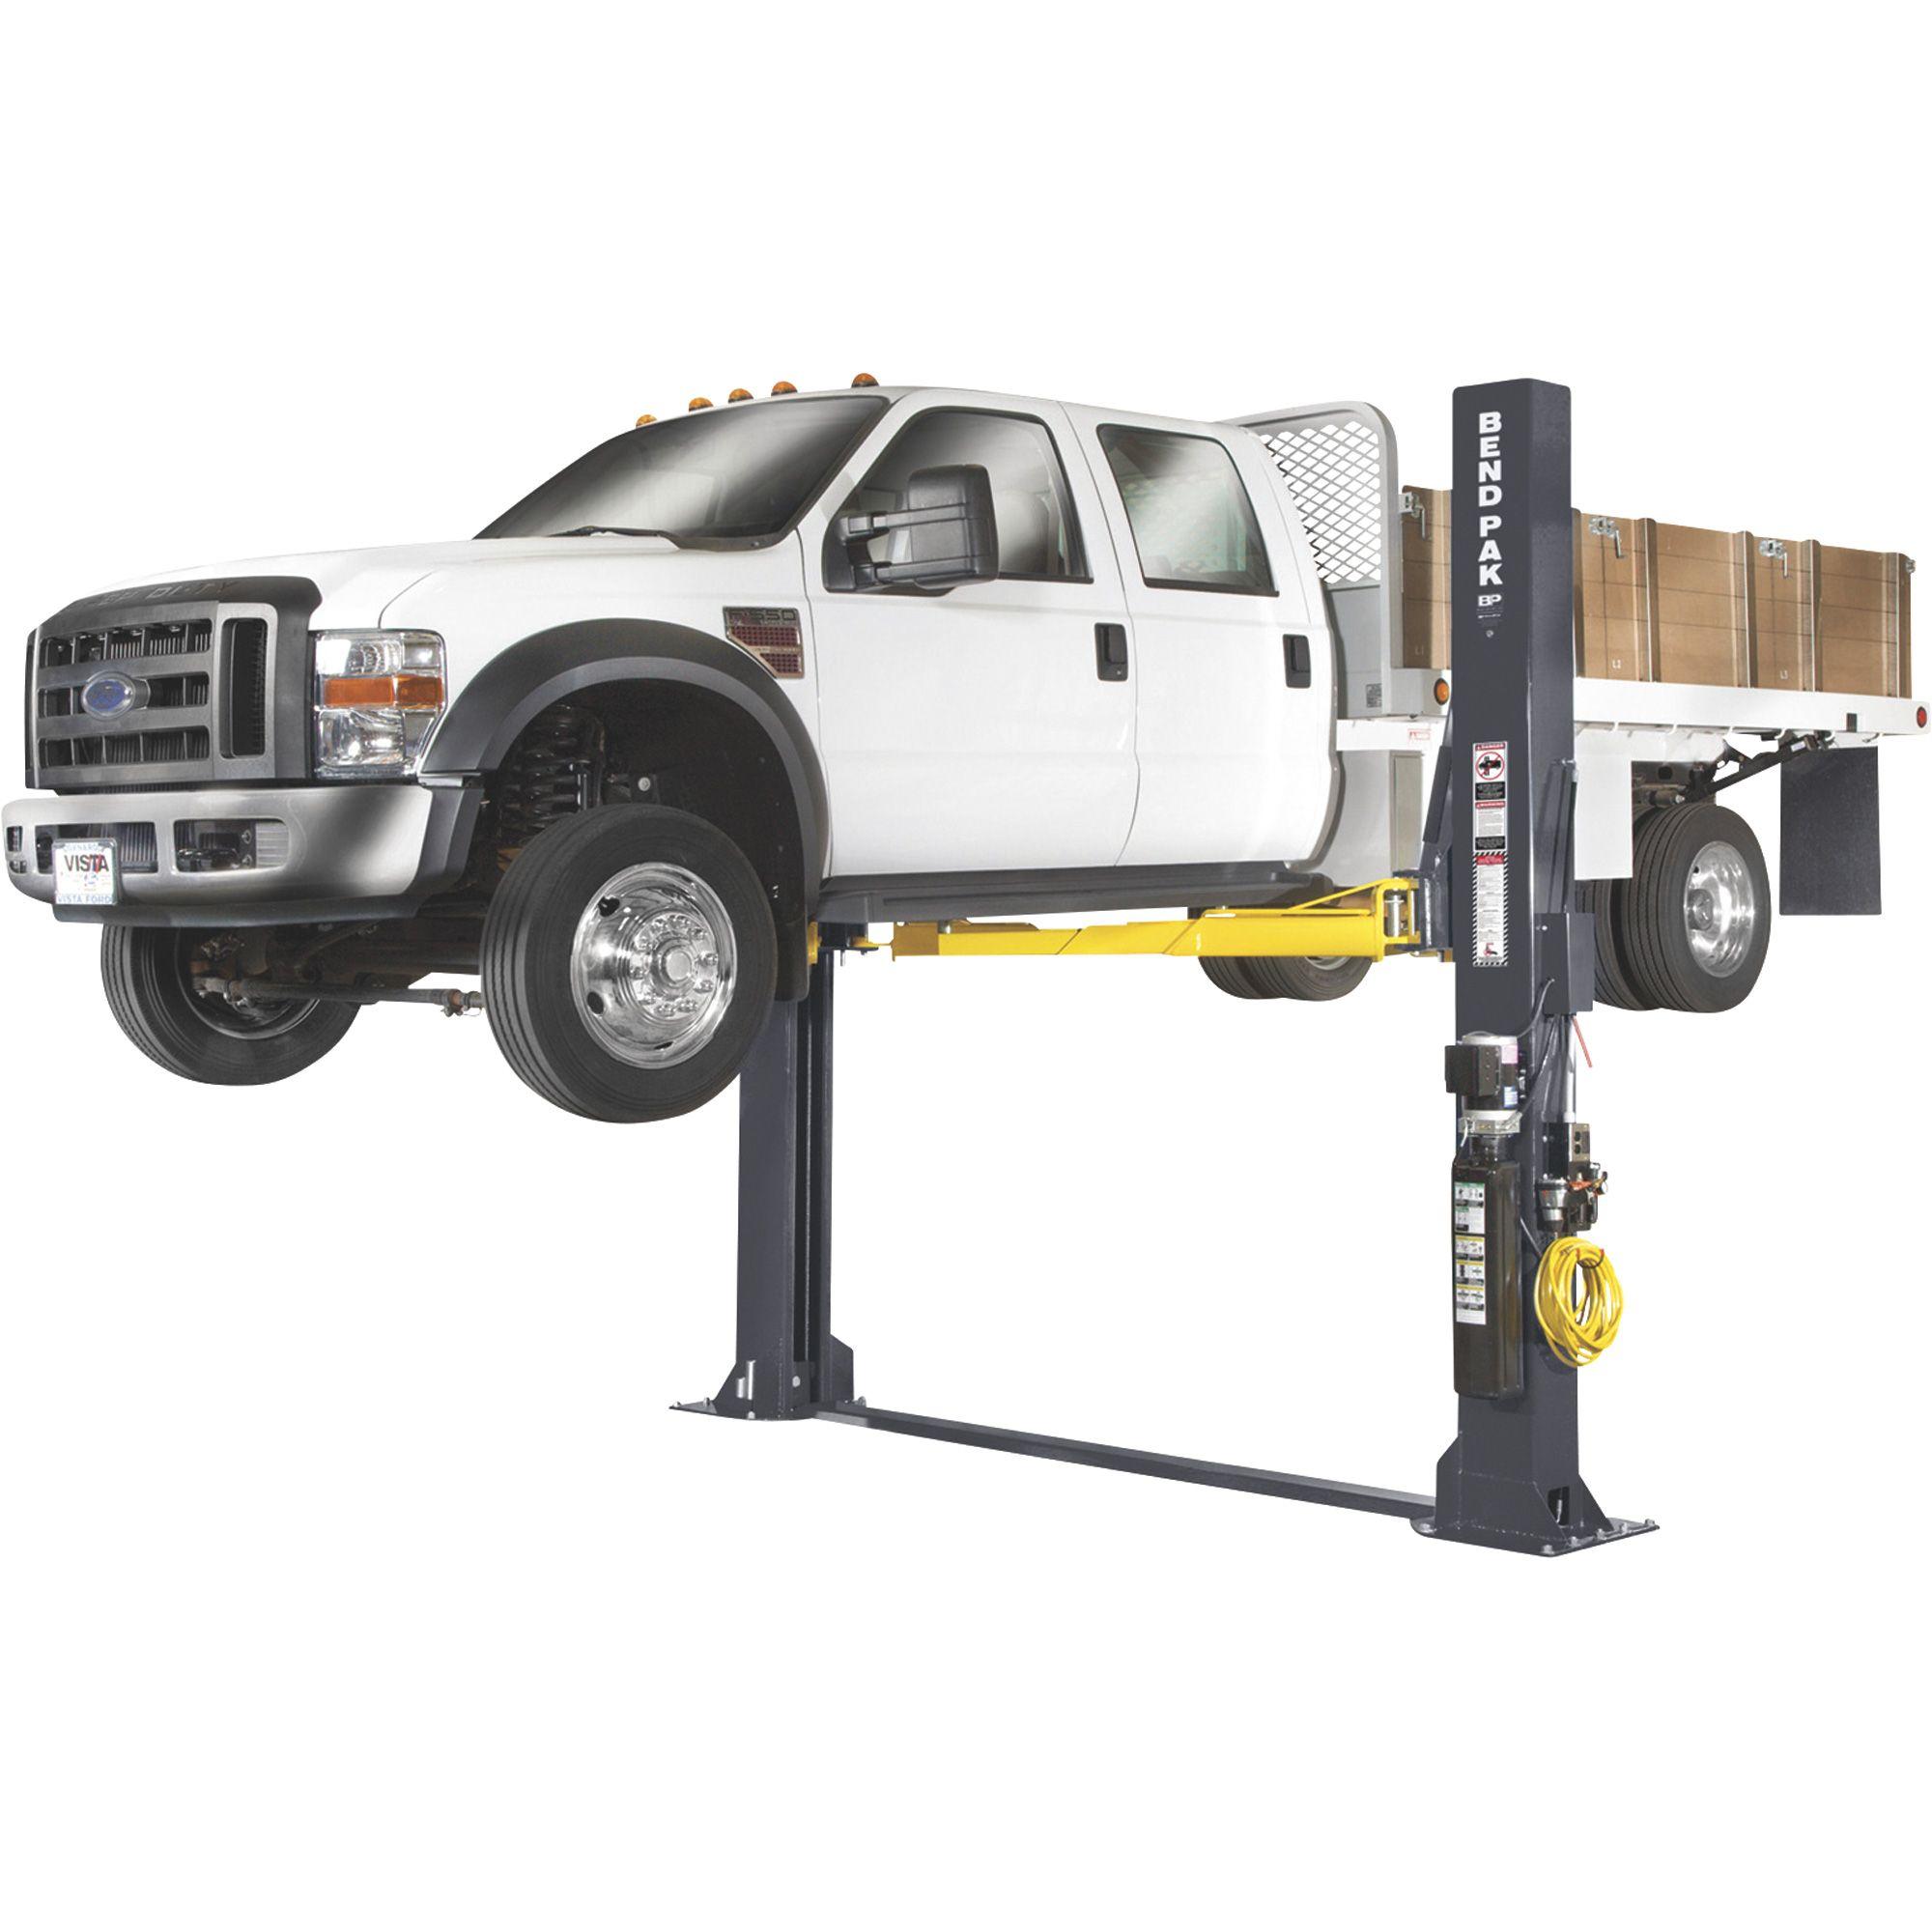 Bendpak Floorplate 2 Post Truck And Car Lift 12 000 Lb Capacity Model Xpr 12fdl Lifted Trucks Chevy Trucks Diesel Trucks